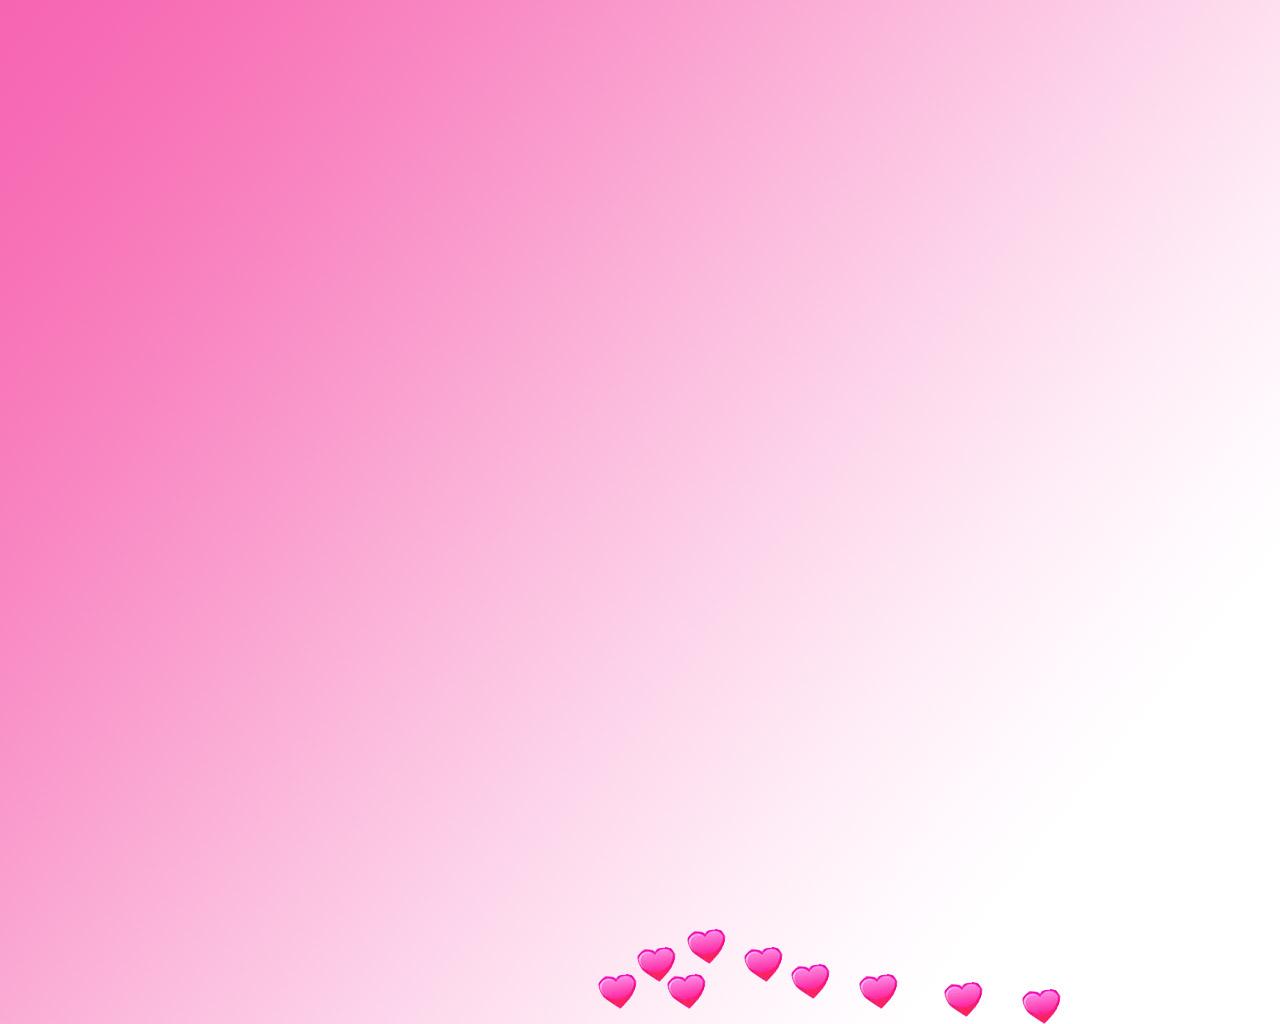 Pink Heart Wallpaper 8763 Hd Wallpapers in Love   Imagesci 1280x1024